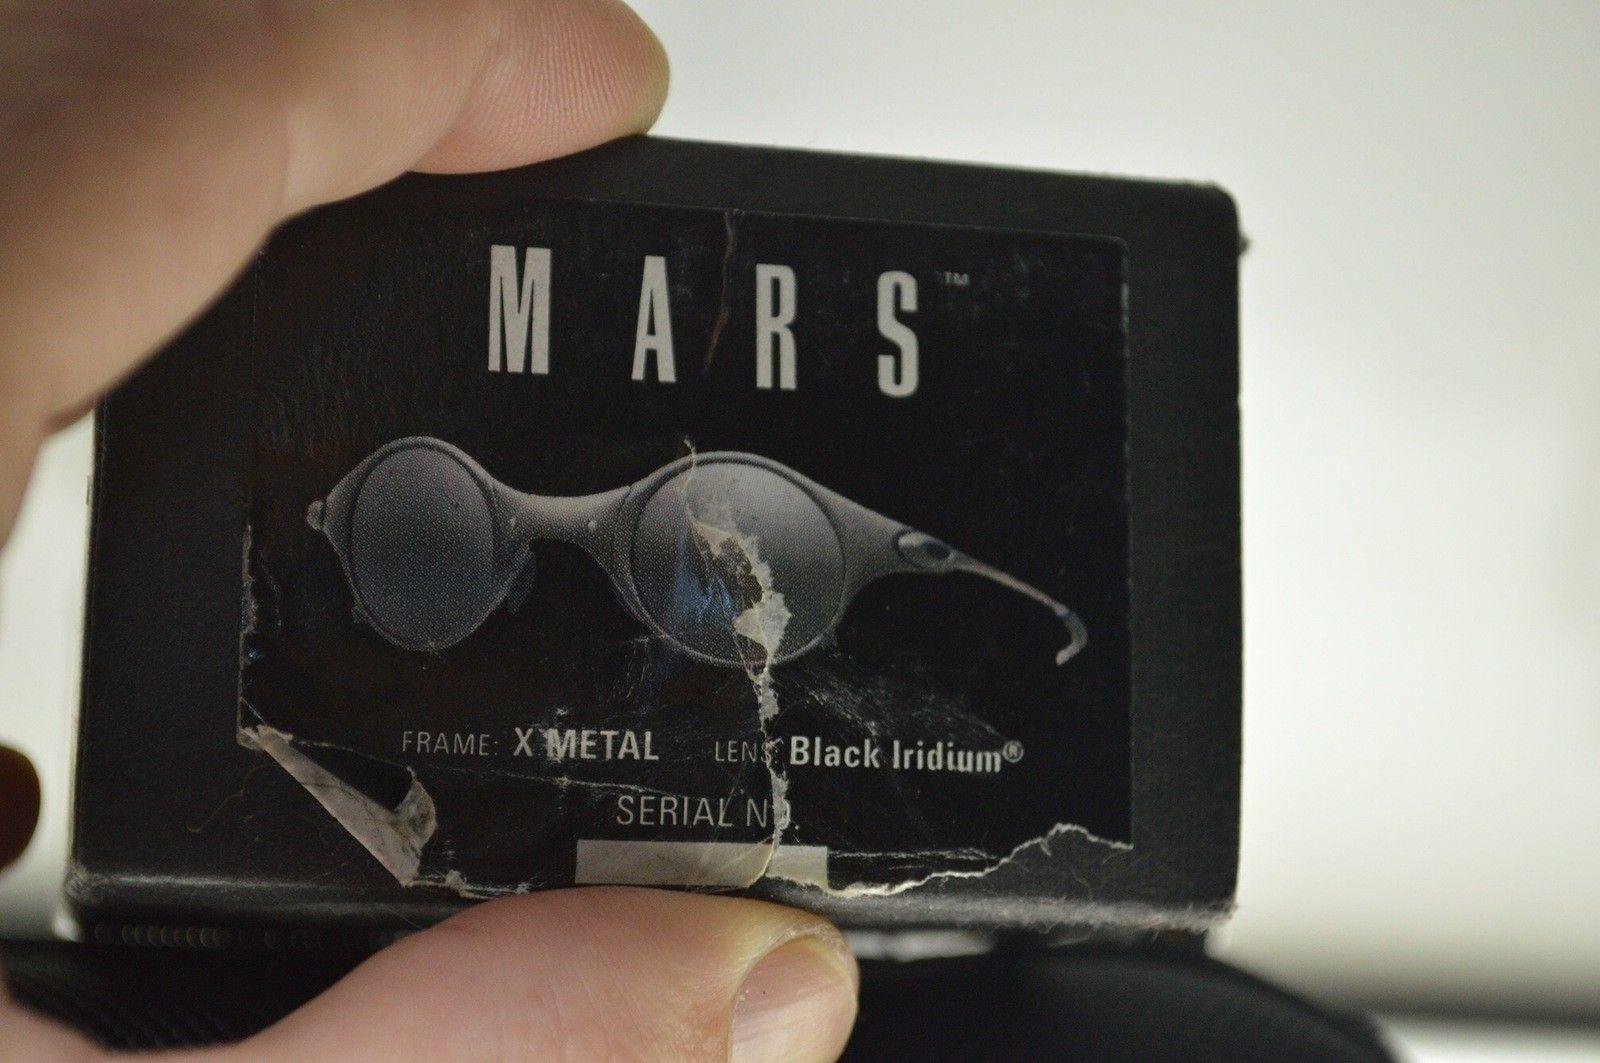 Mars Xmetal w/ Black Iridium + xtras #SOLD - image.jpeg